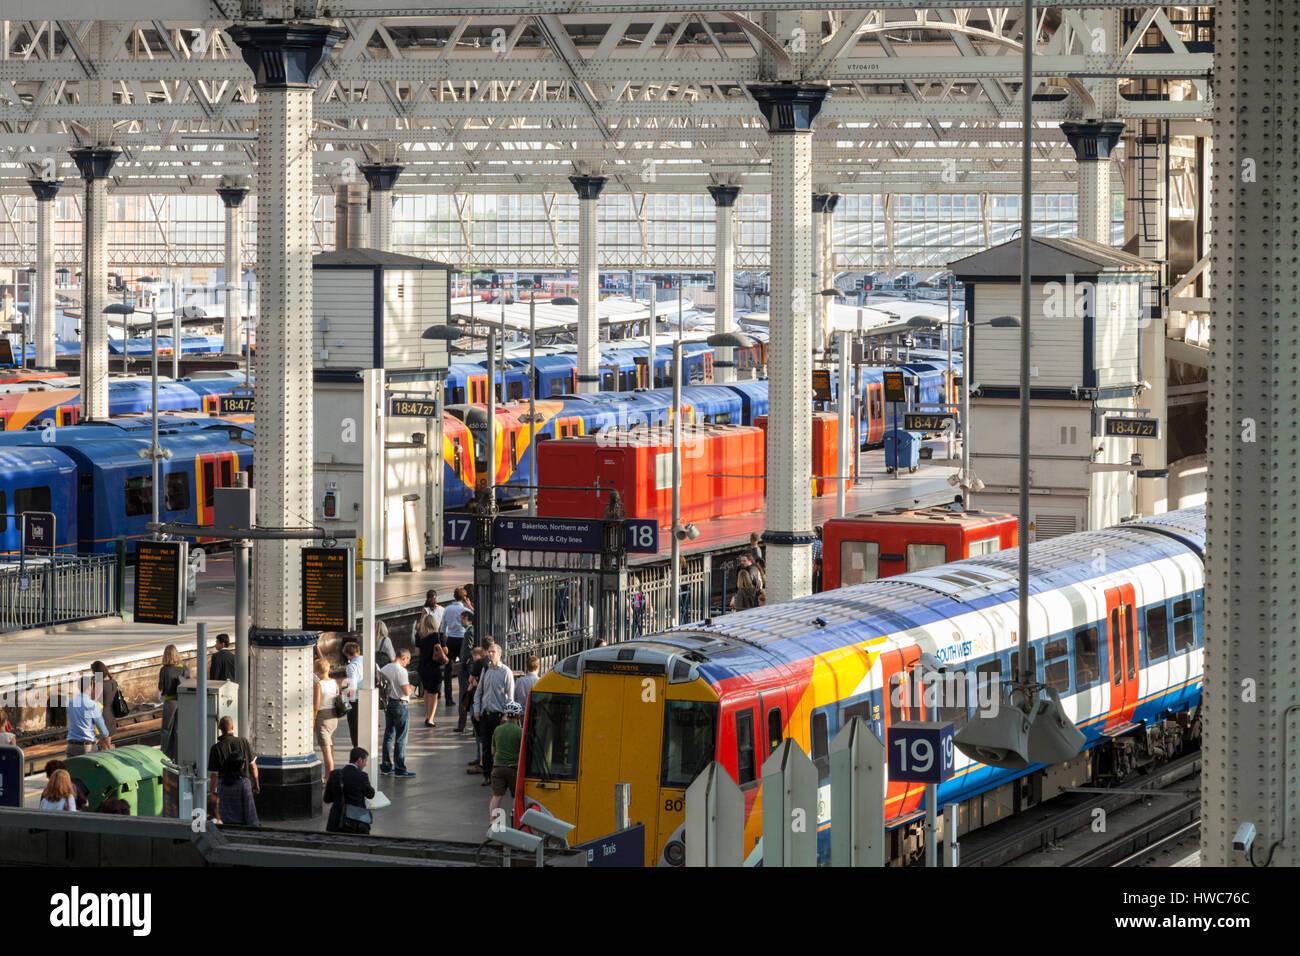 Passengers and trains at Waterloo Railway Station, London, England, UK - Stock Image